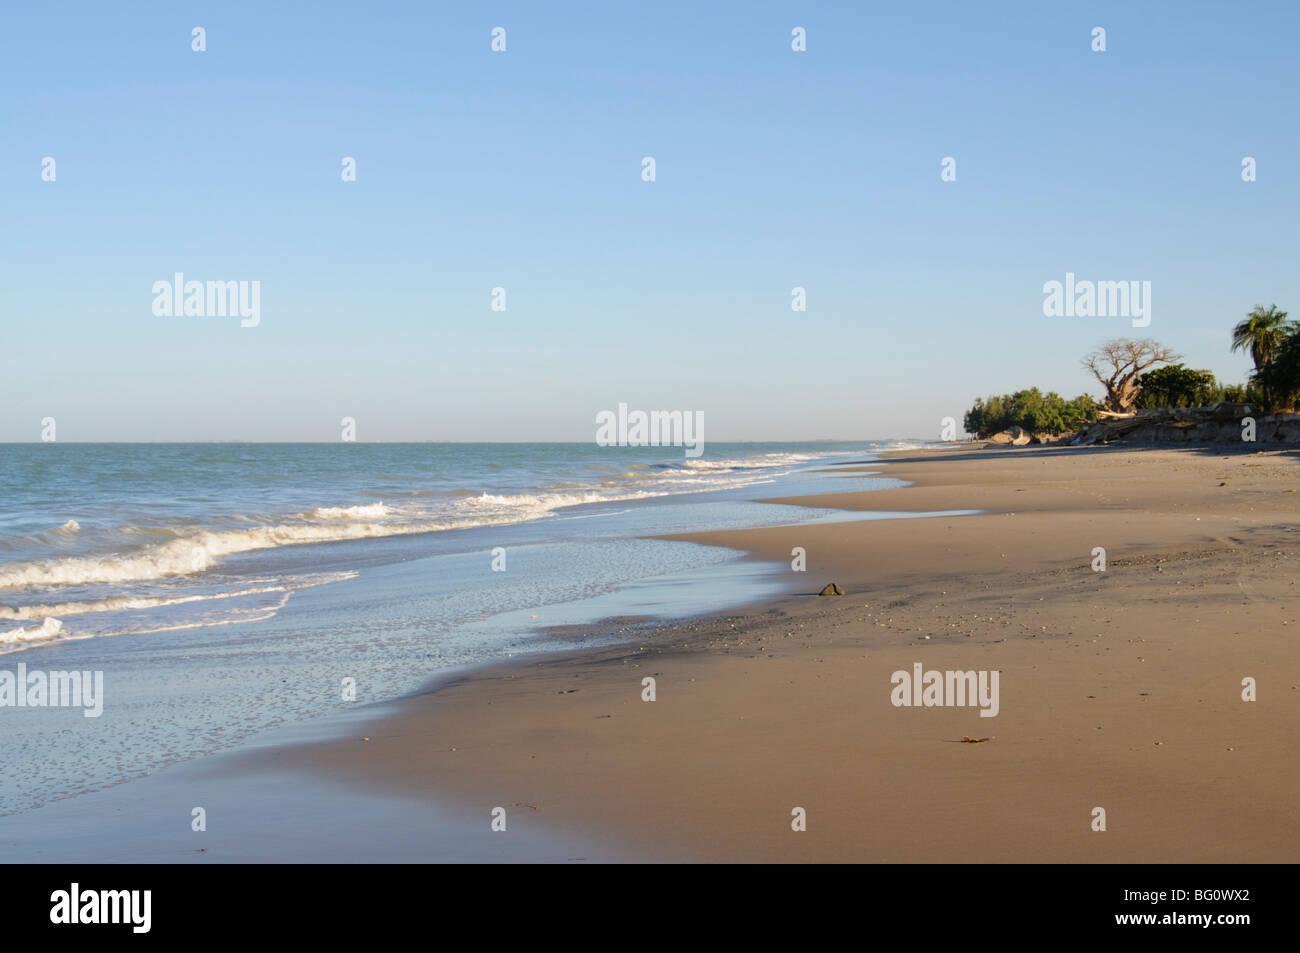 Deserted beach, Sine Saloum Delta, Senegal, West Africa, Africa - Stock Image